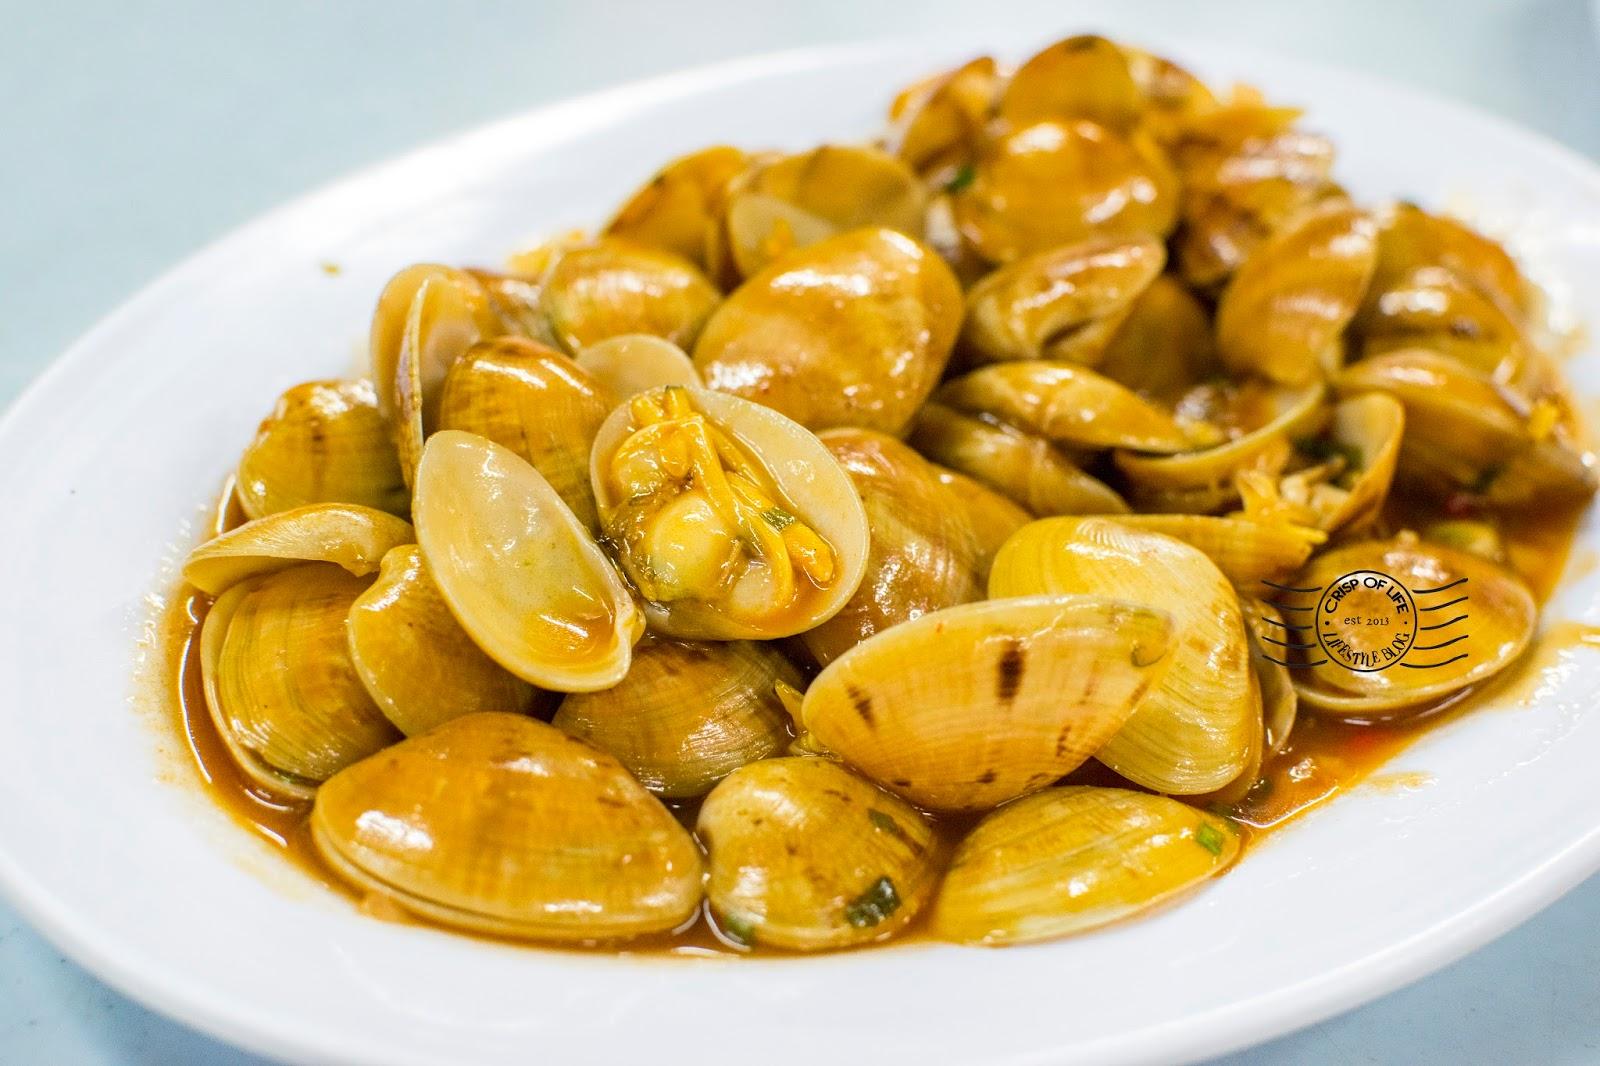 Good Friend Restaurant Teluk Kumbar Seafood, Penang